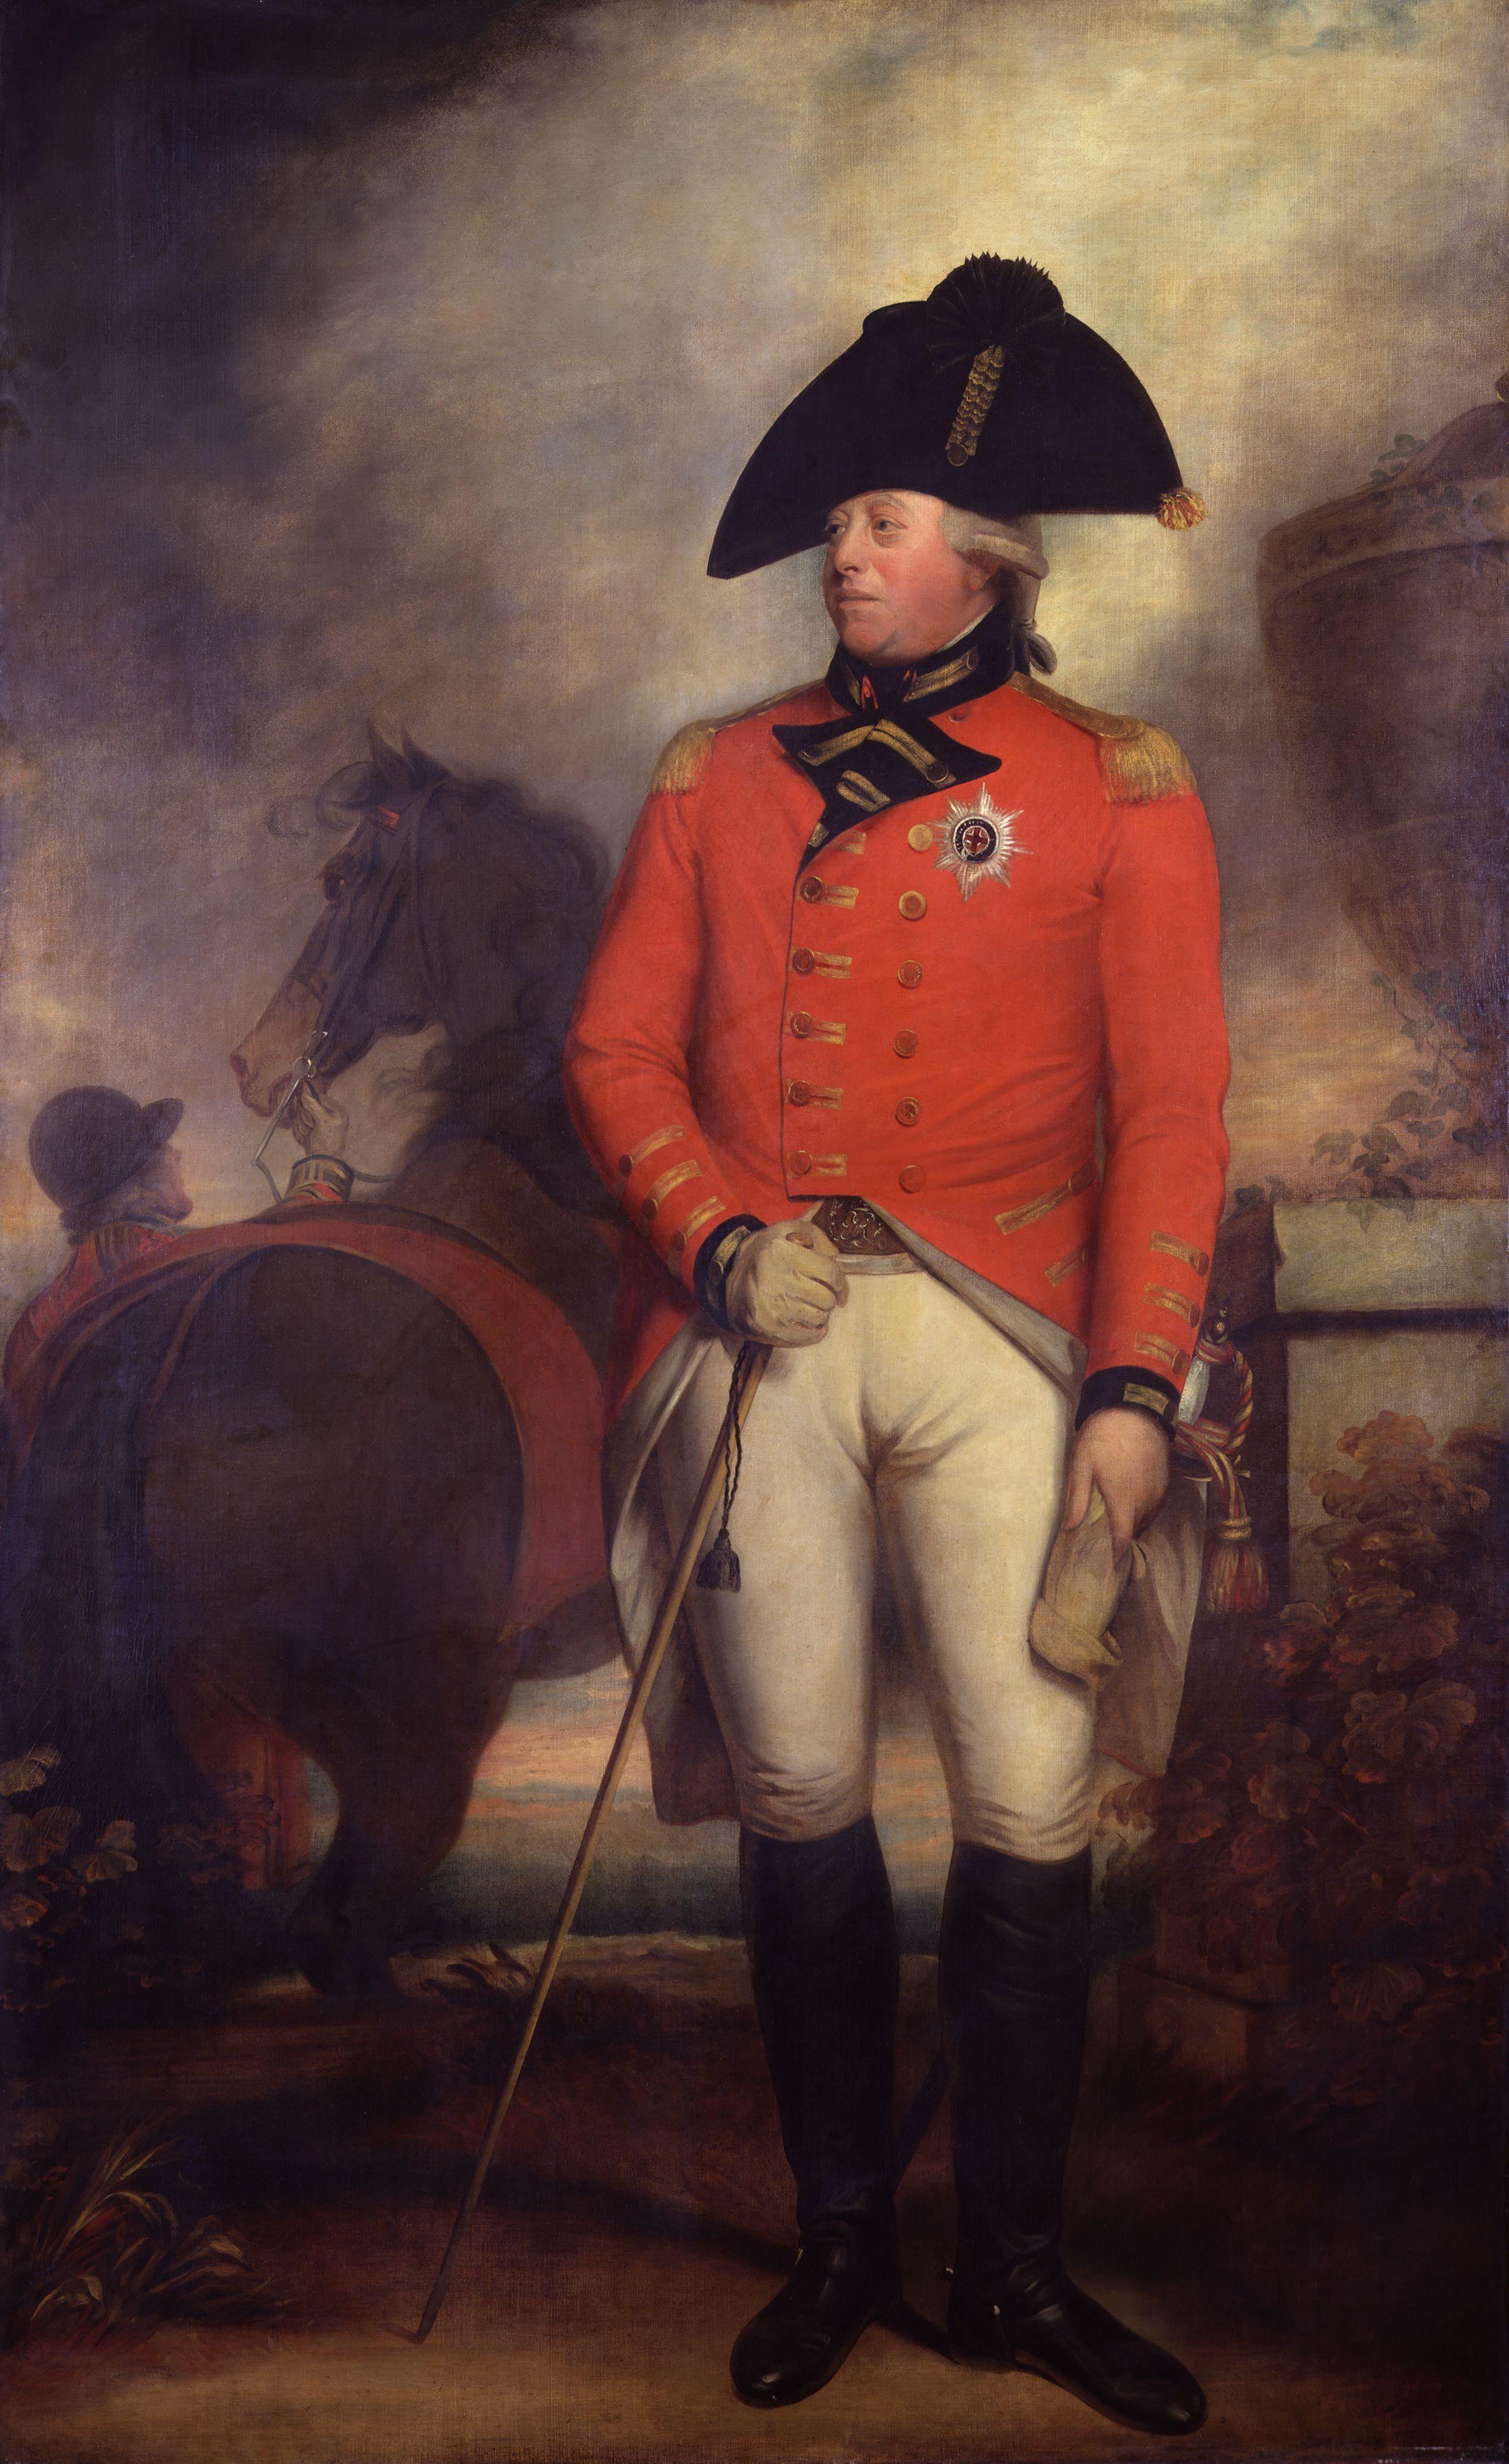 Sir William Beechey: His Britannic Majesty King George III